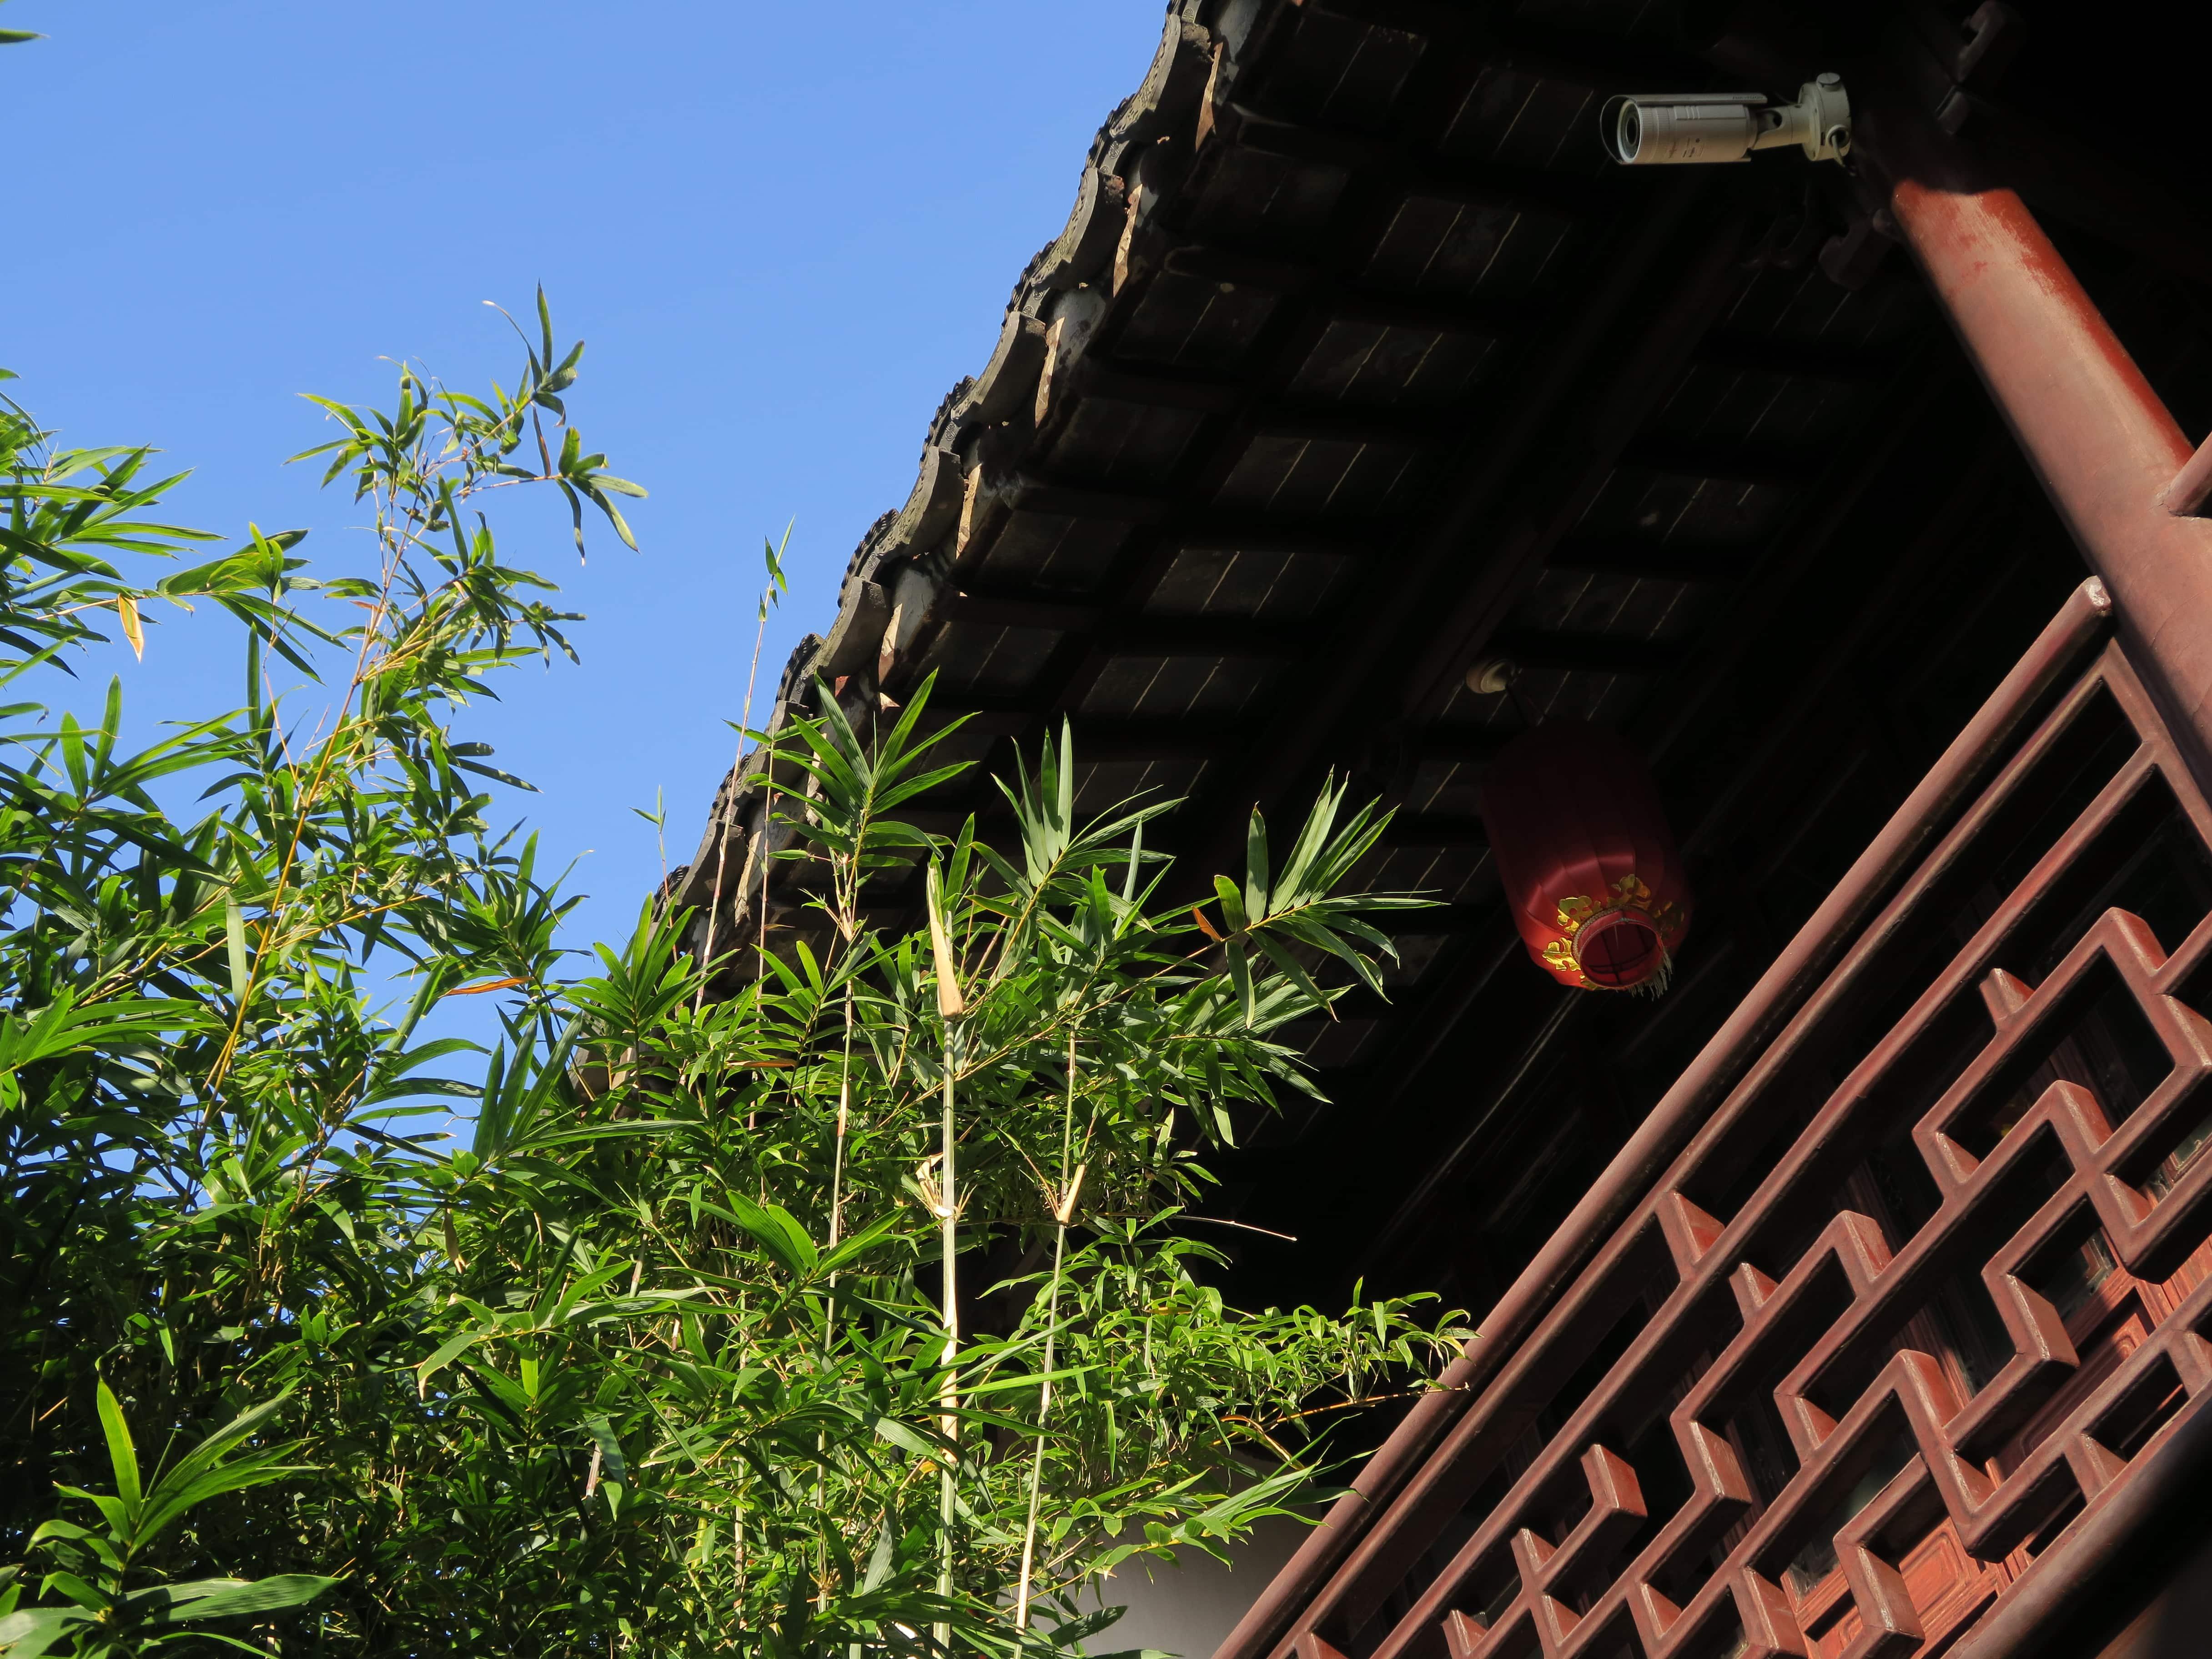 Balkon eines Pavillons hinter Bambus